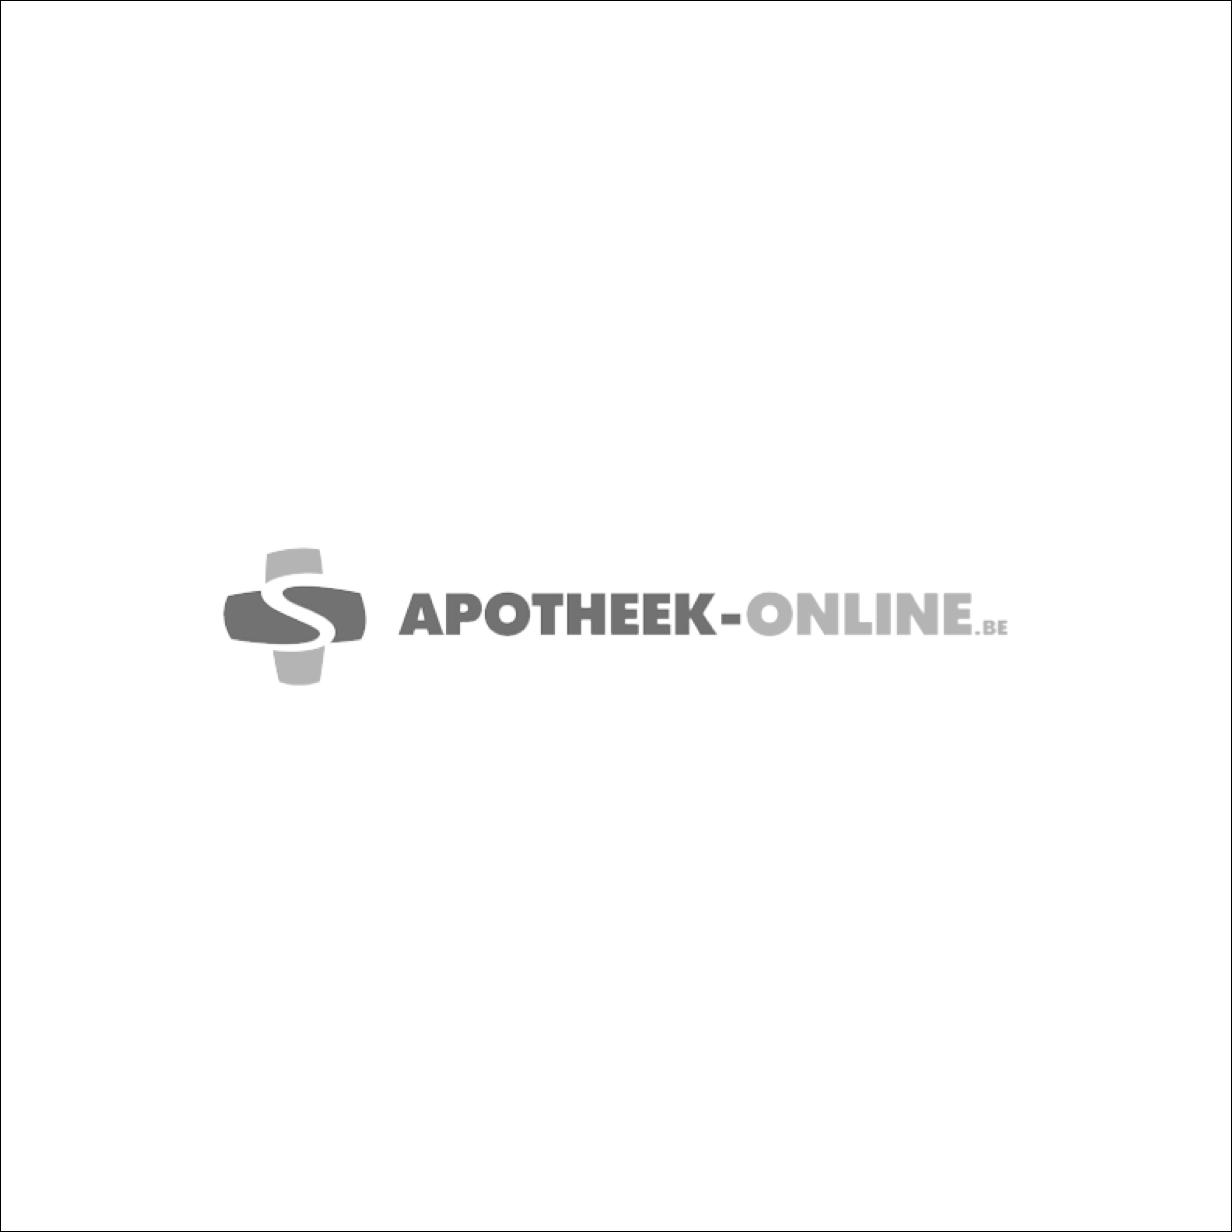 MESOFT CP N/ST 4C 10,0X10,0CM 100 156315